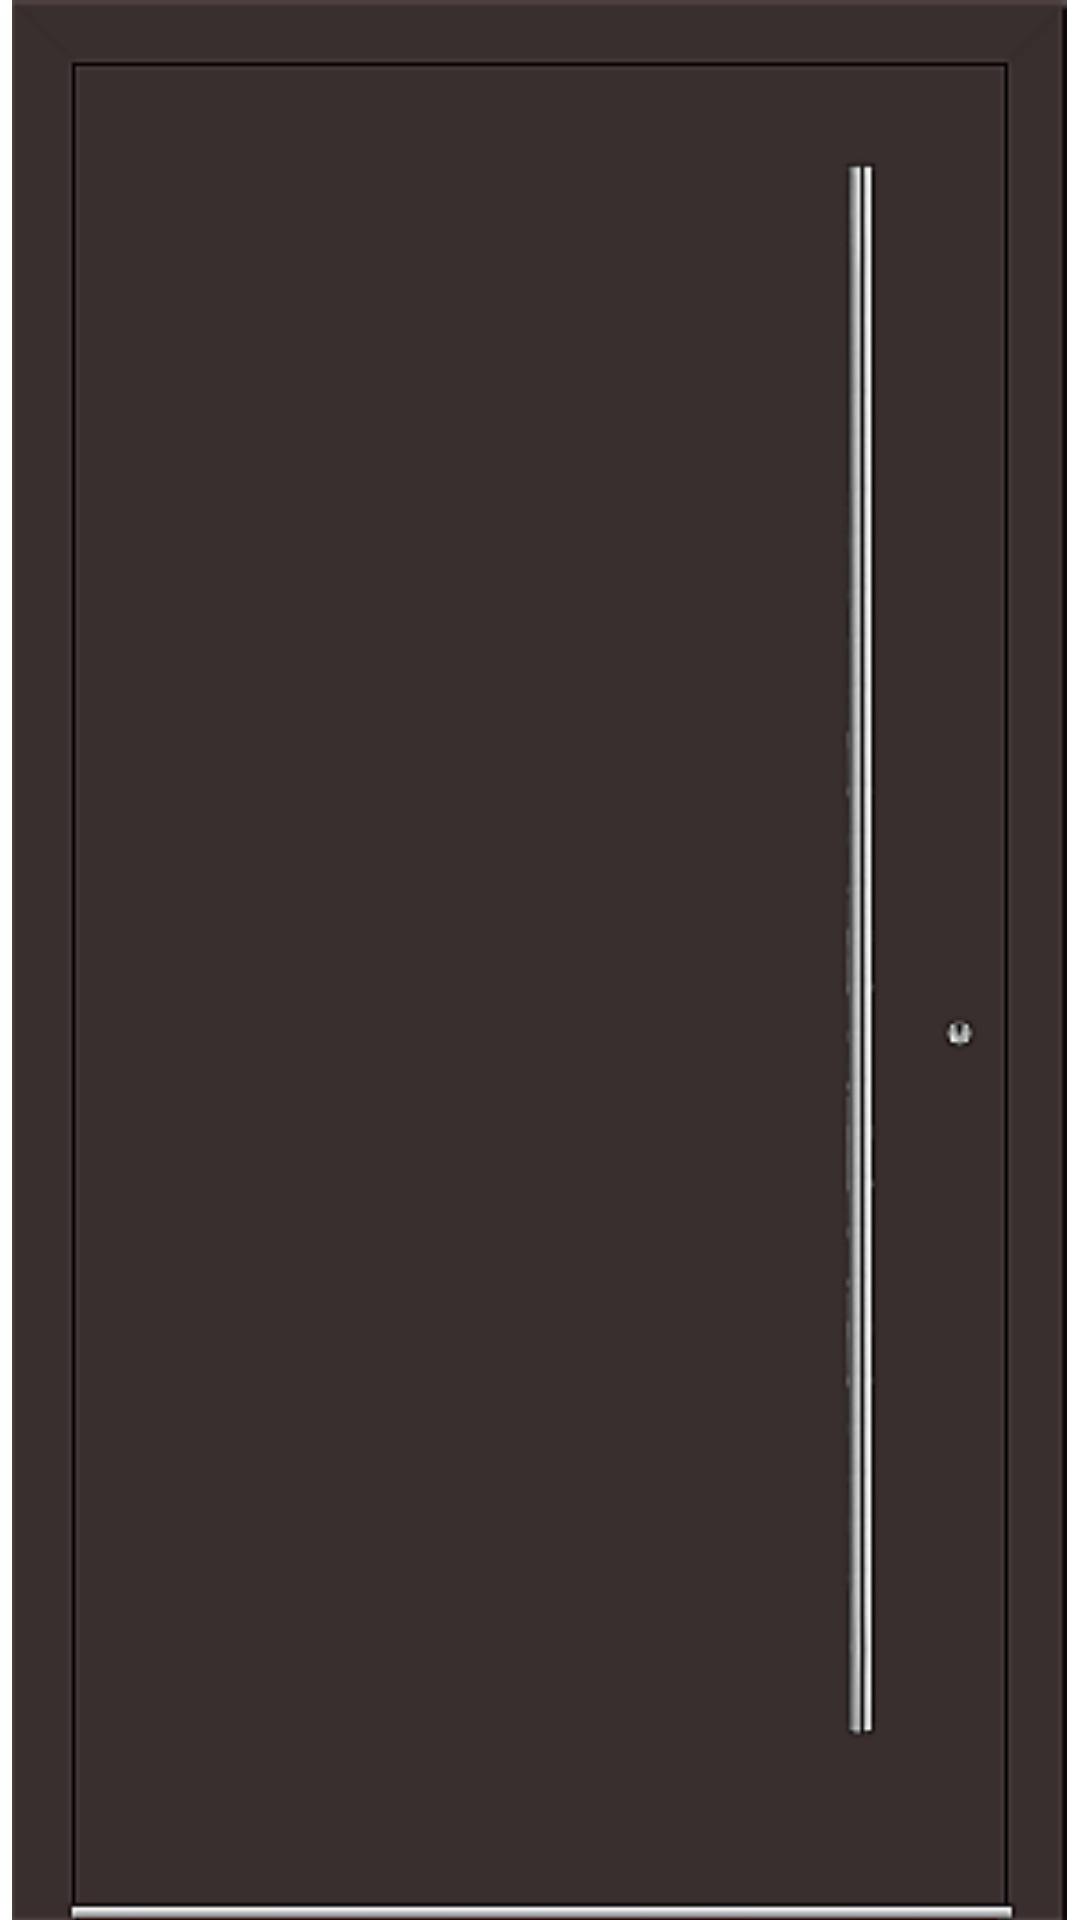 PaXentree Aluminium Haustür M06001 schokoladenbraun